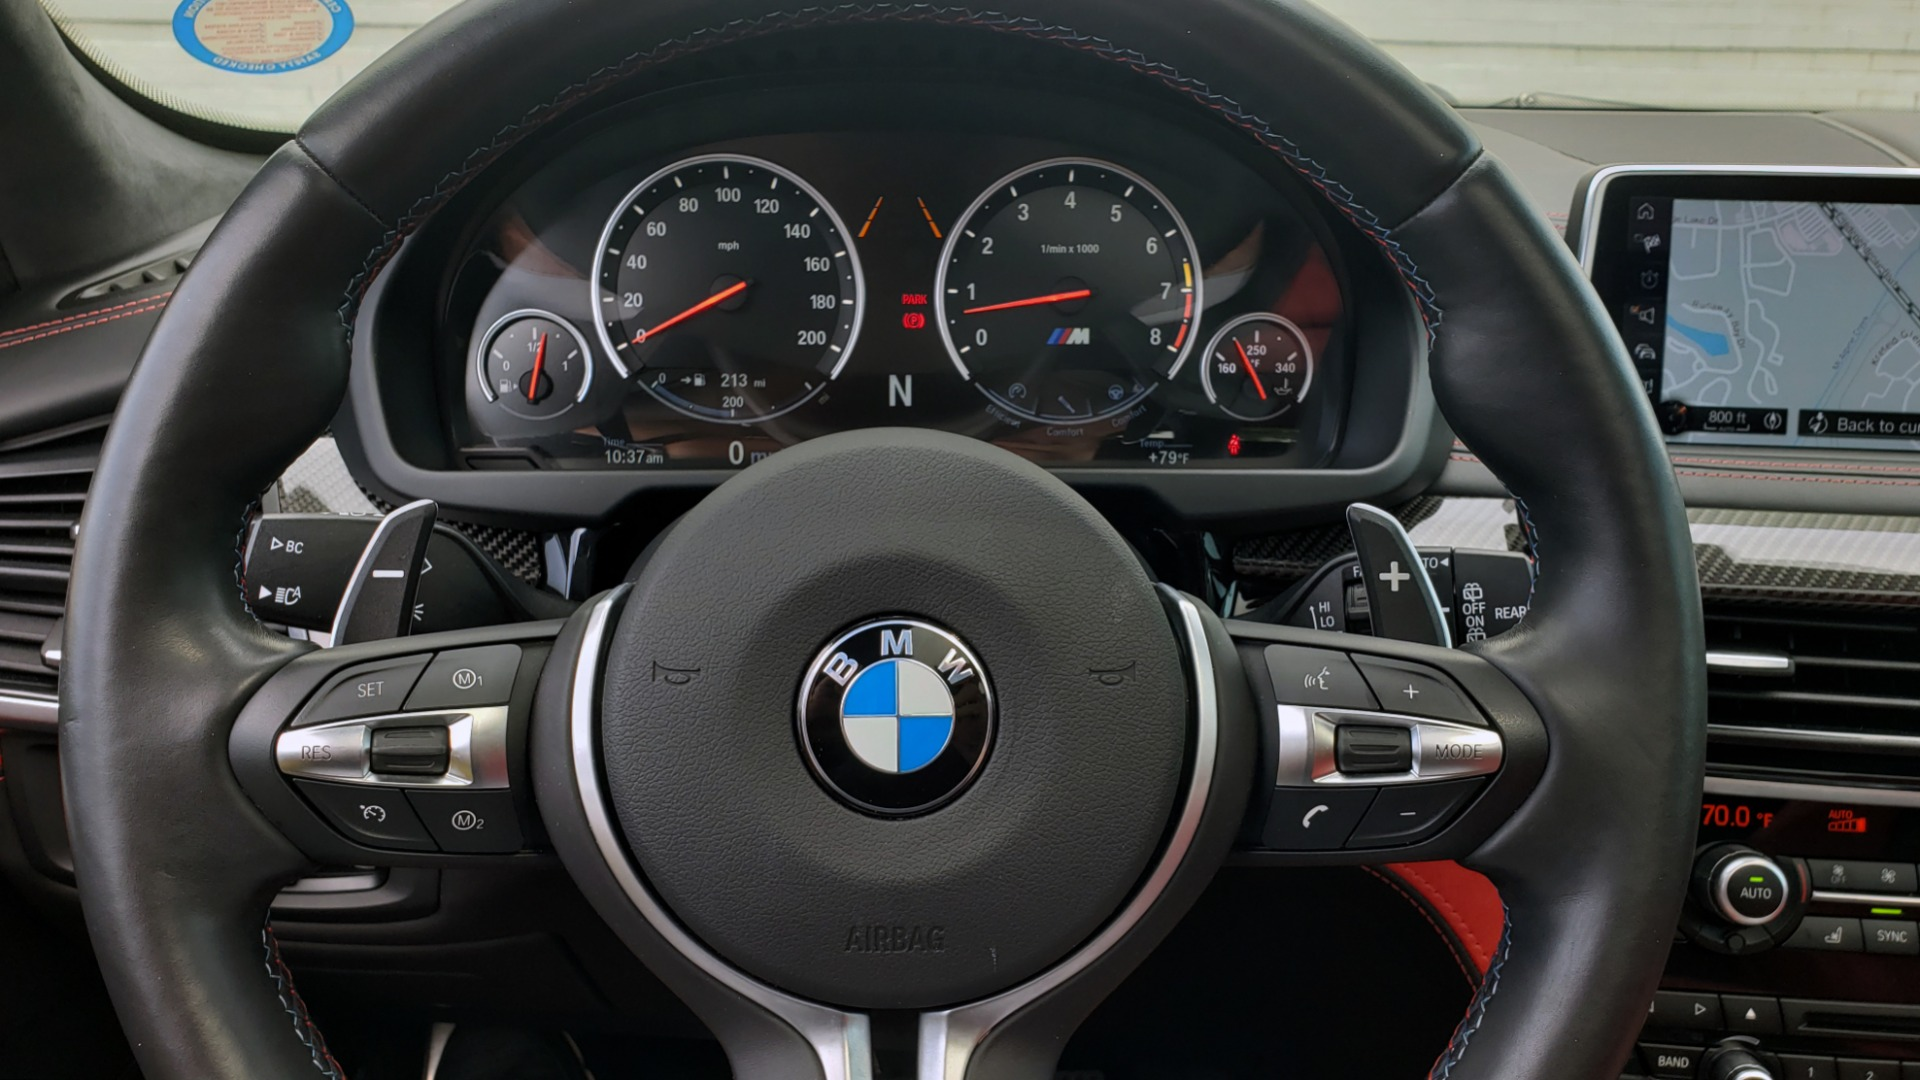 Used 2017 BMW X5 M EXECUTIVE PKG / NAV / DRVR ASST / BSM / HUD / HTD STS / WIFI for sale Sold at Formula Imports in Charlotte NC 28227 38